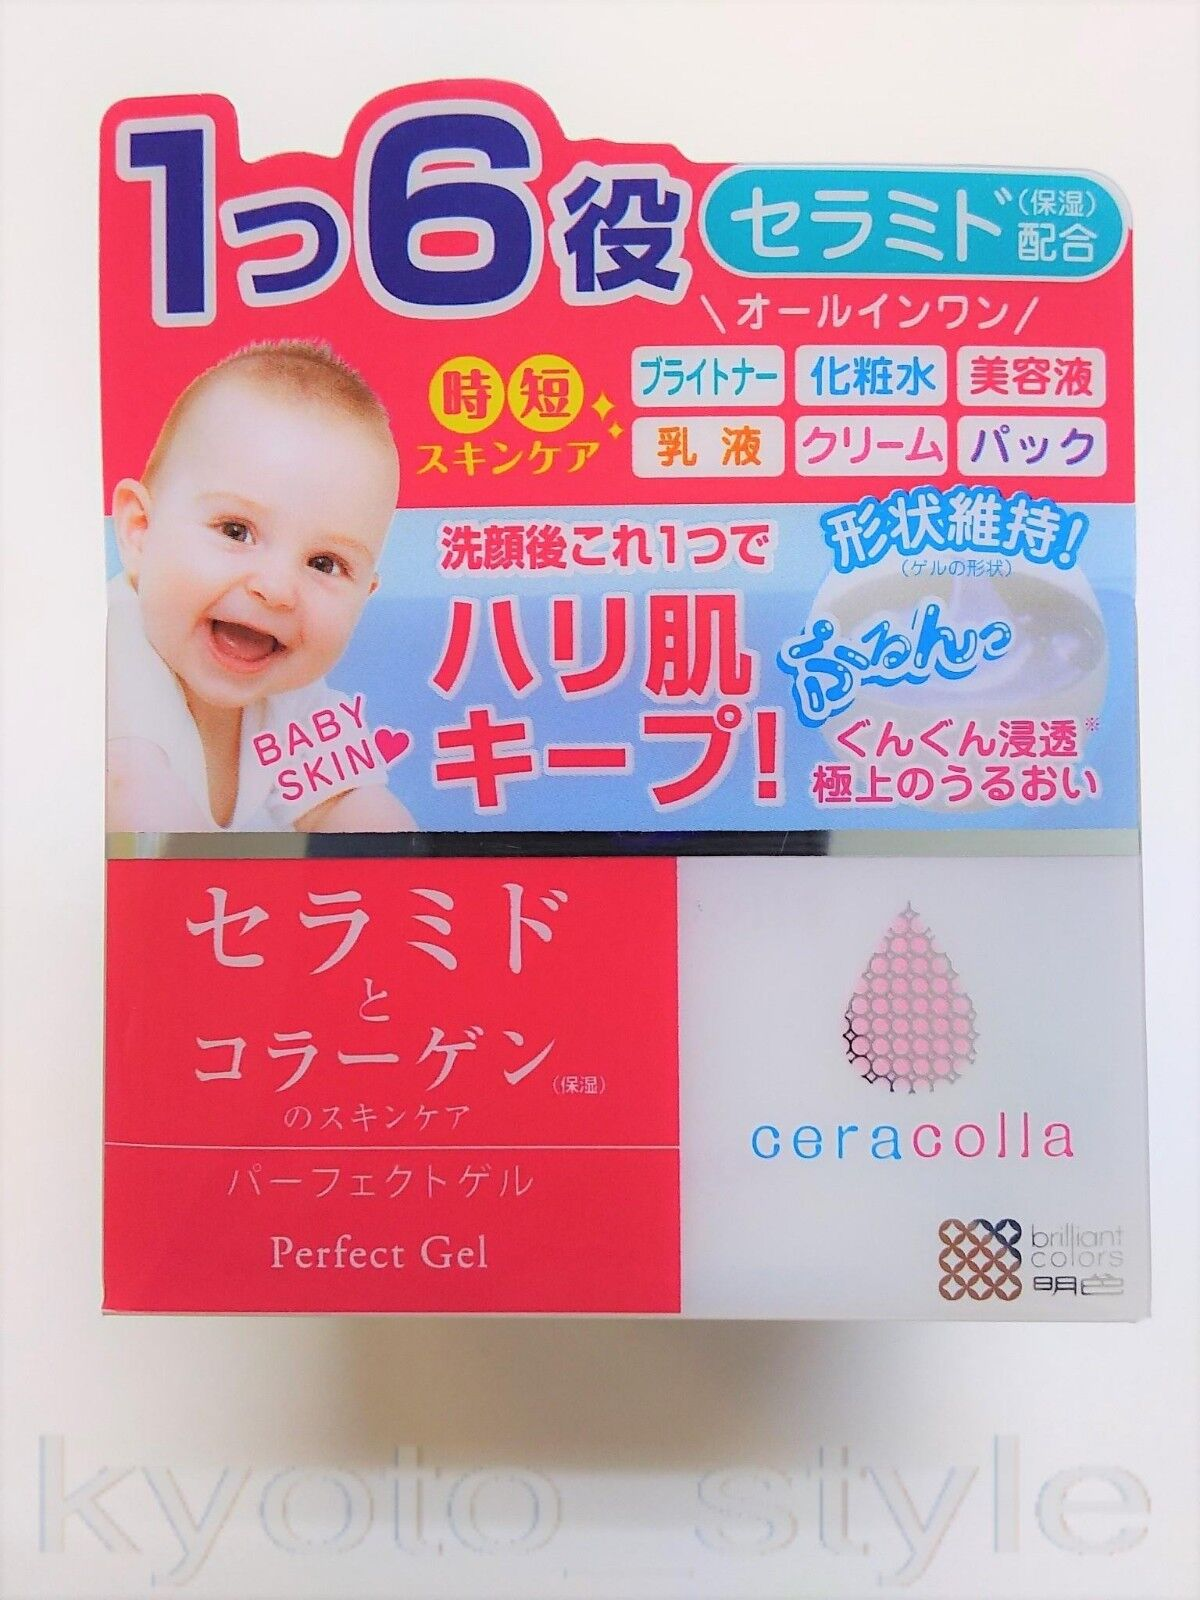 Meishoku Light color cosmetics Serakora Perfect gel 90g MADE IN JAPAN